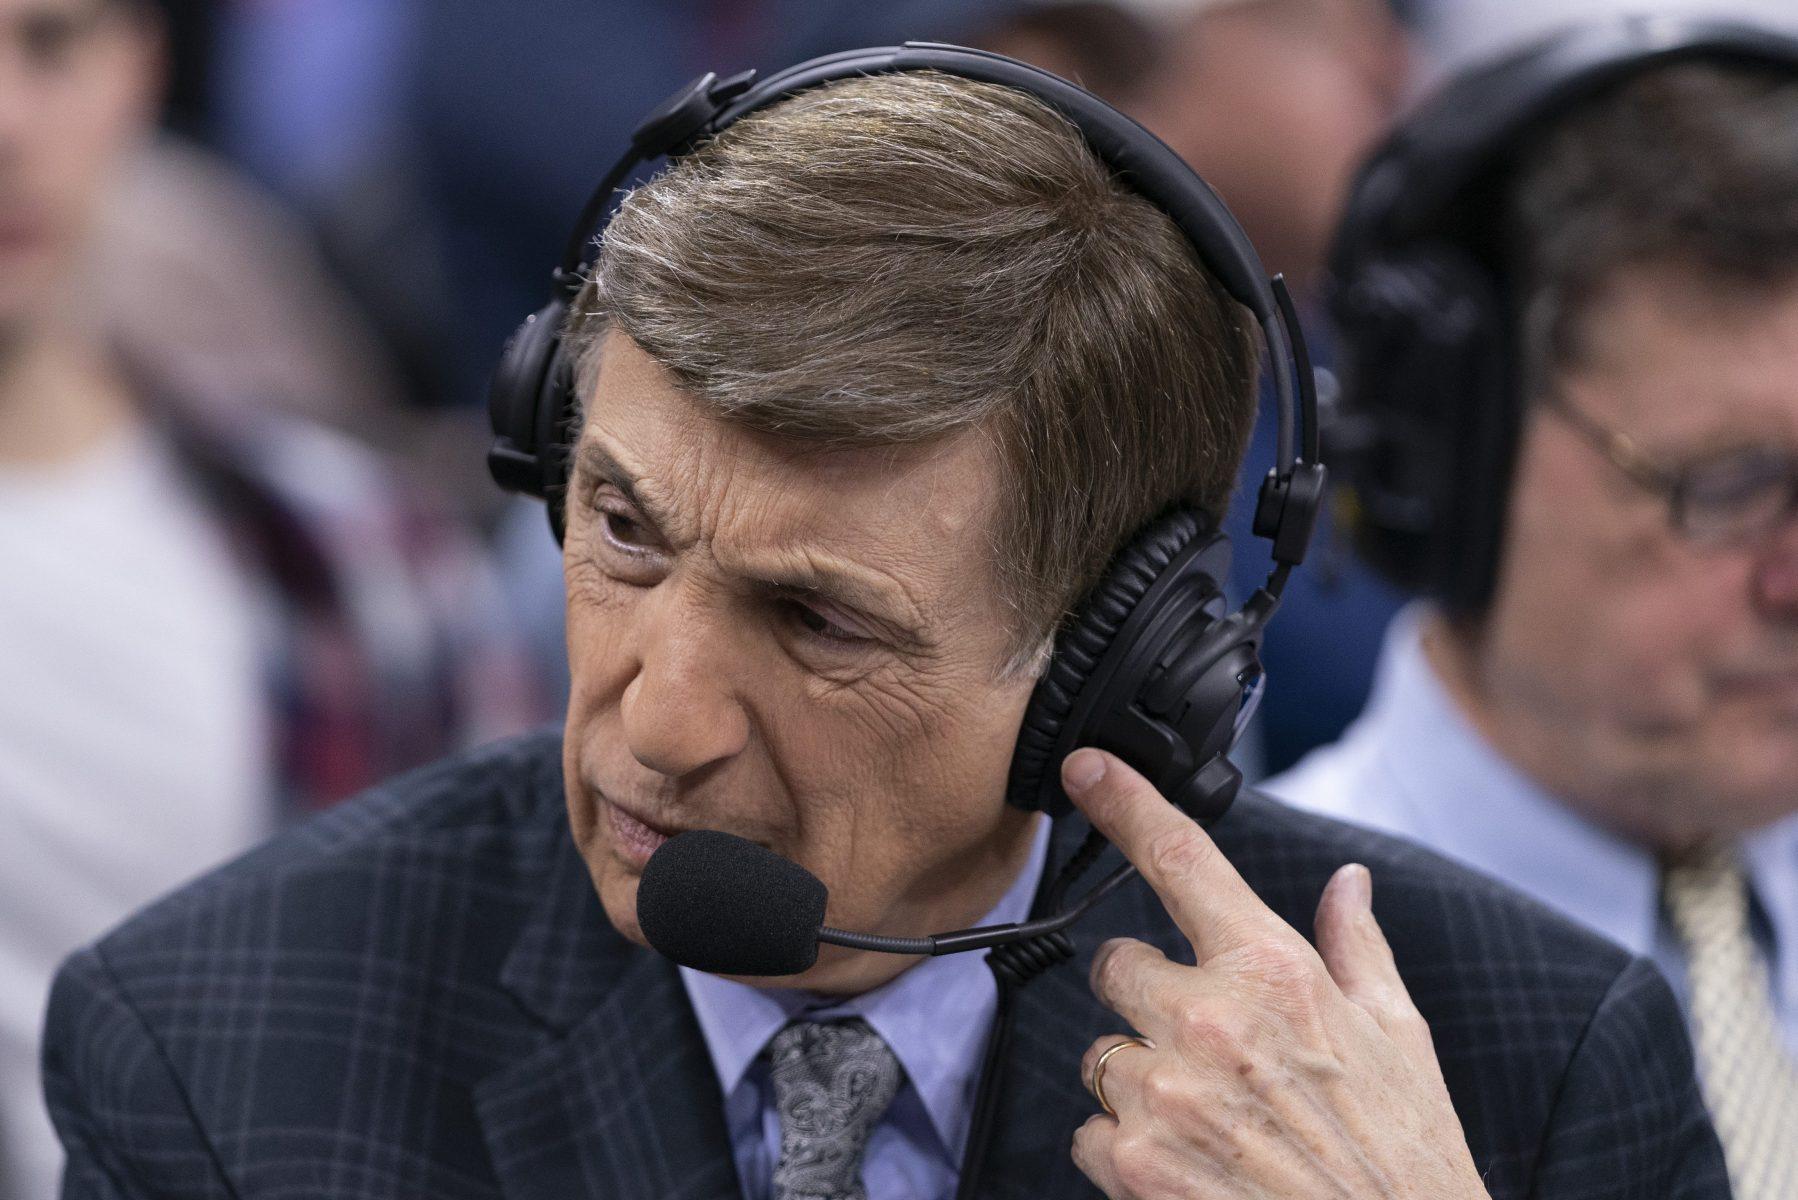 Veteran Basketball Announcer Marv Albert to Sit Out NBA Restart